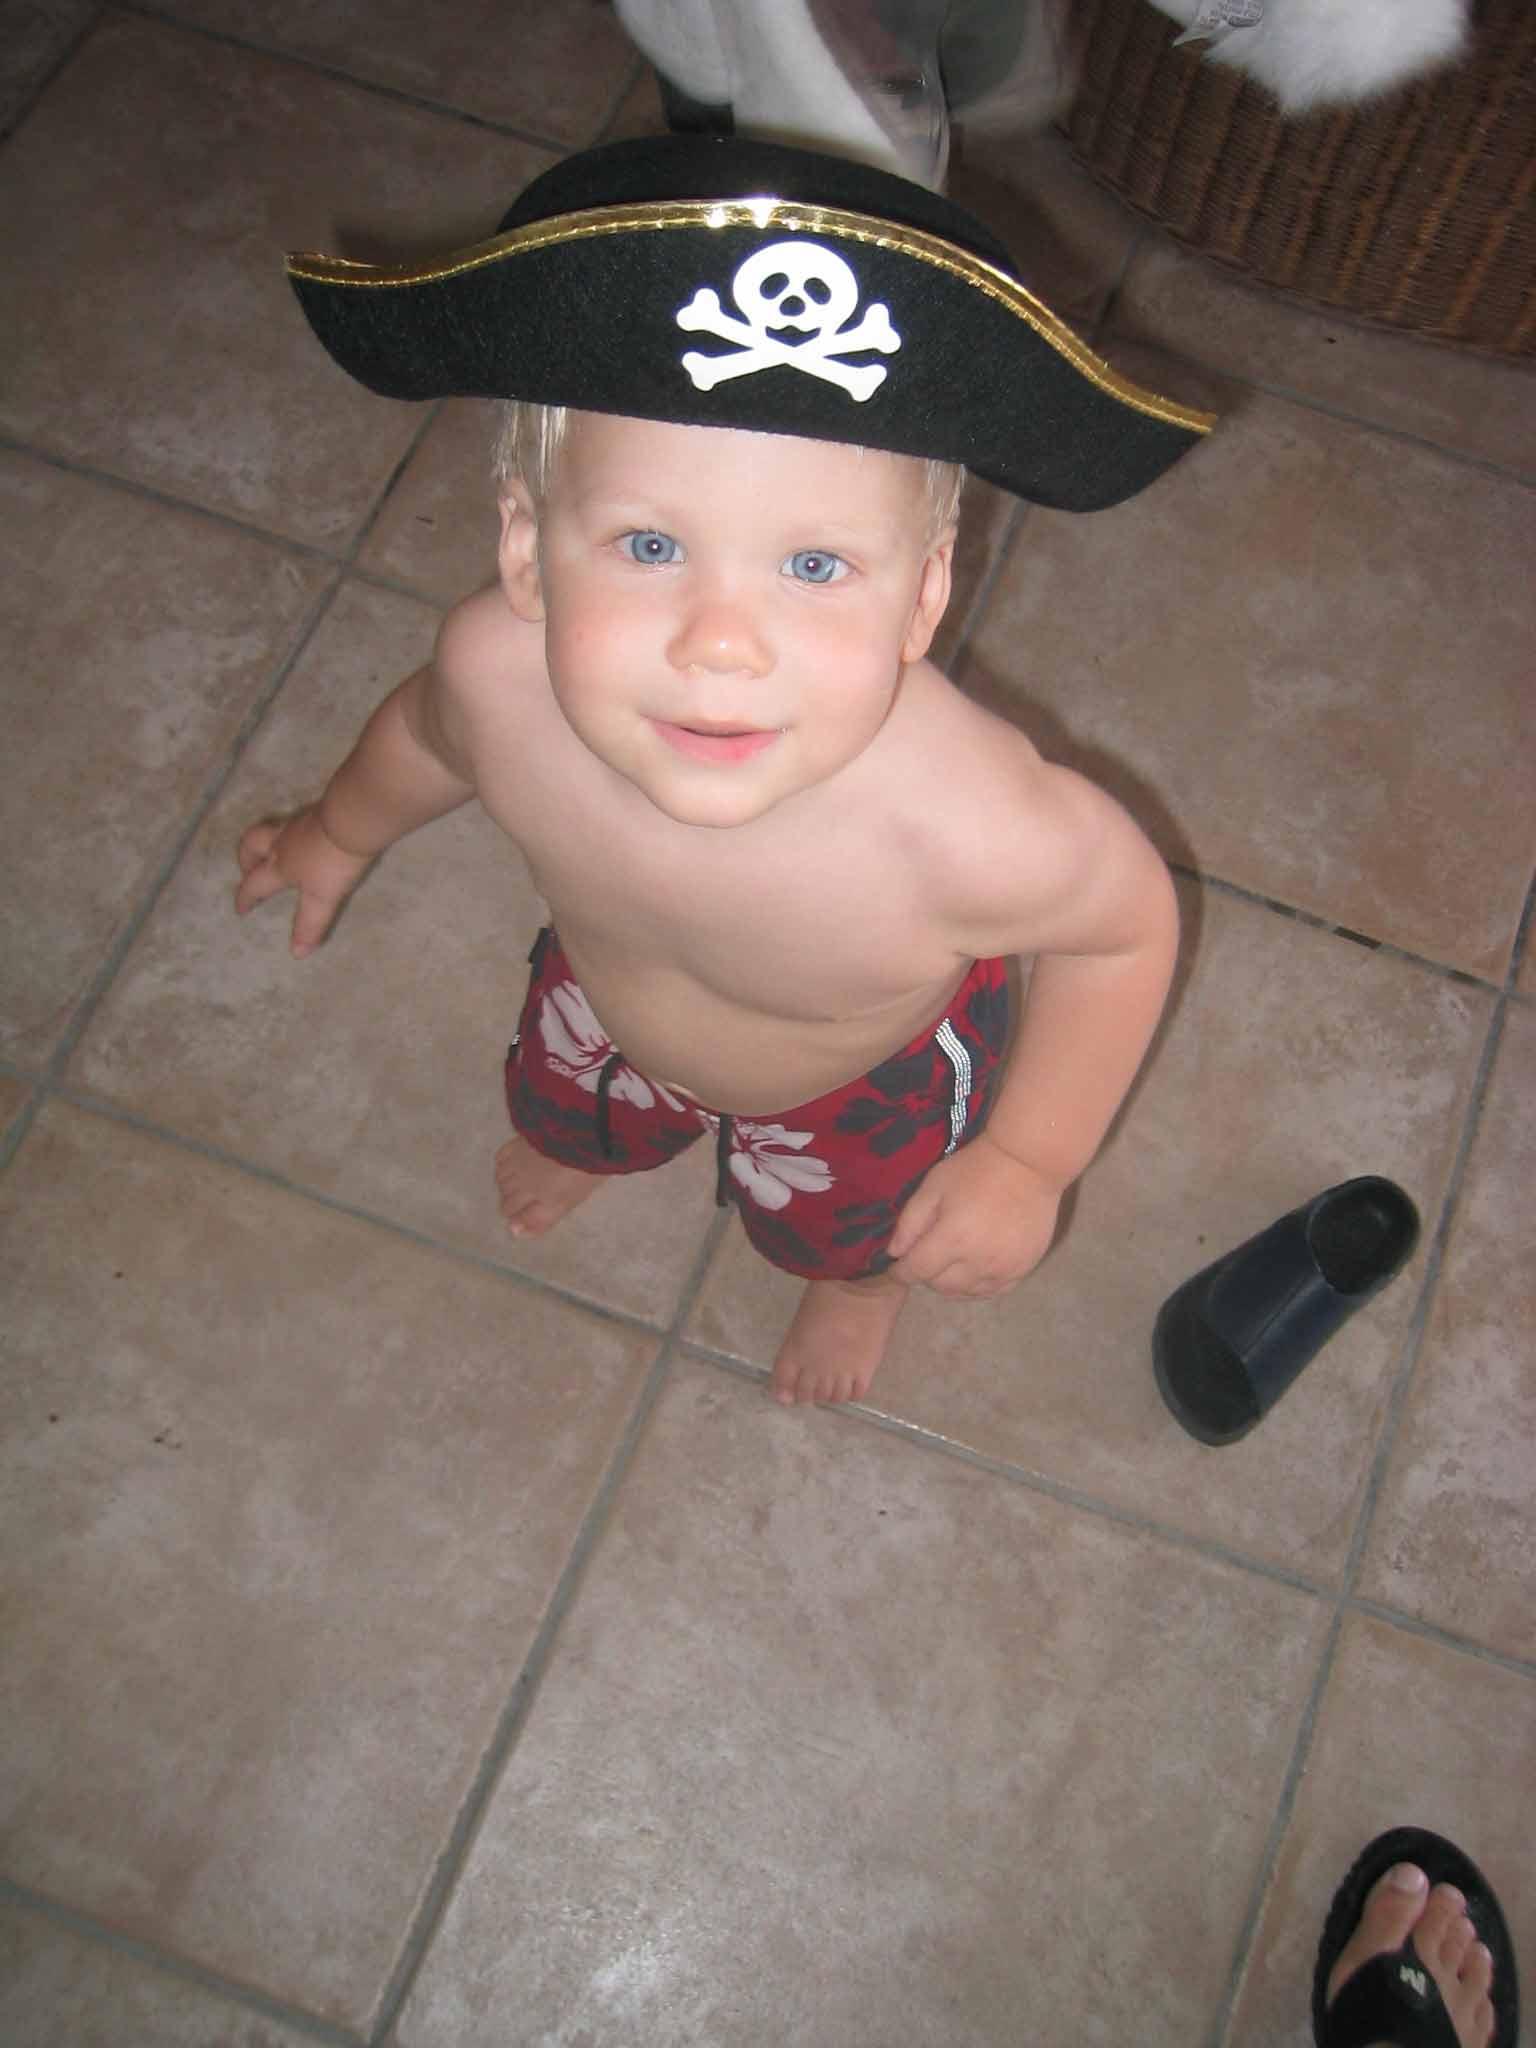 pirate_nick_1.jpg